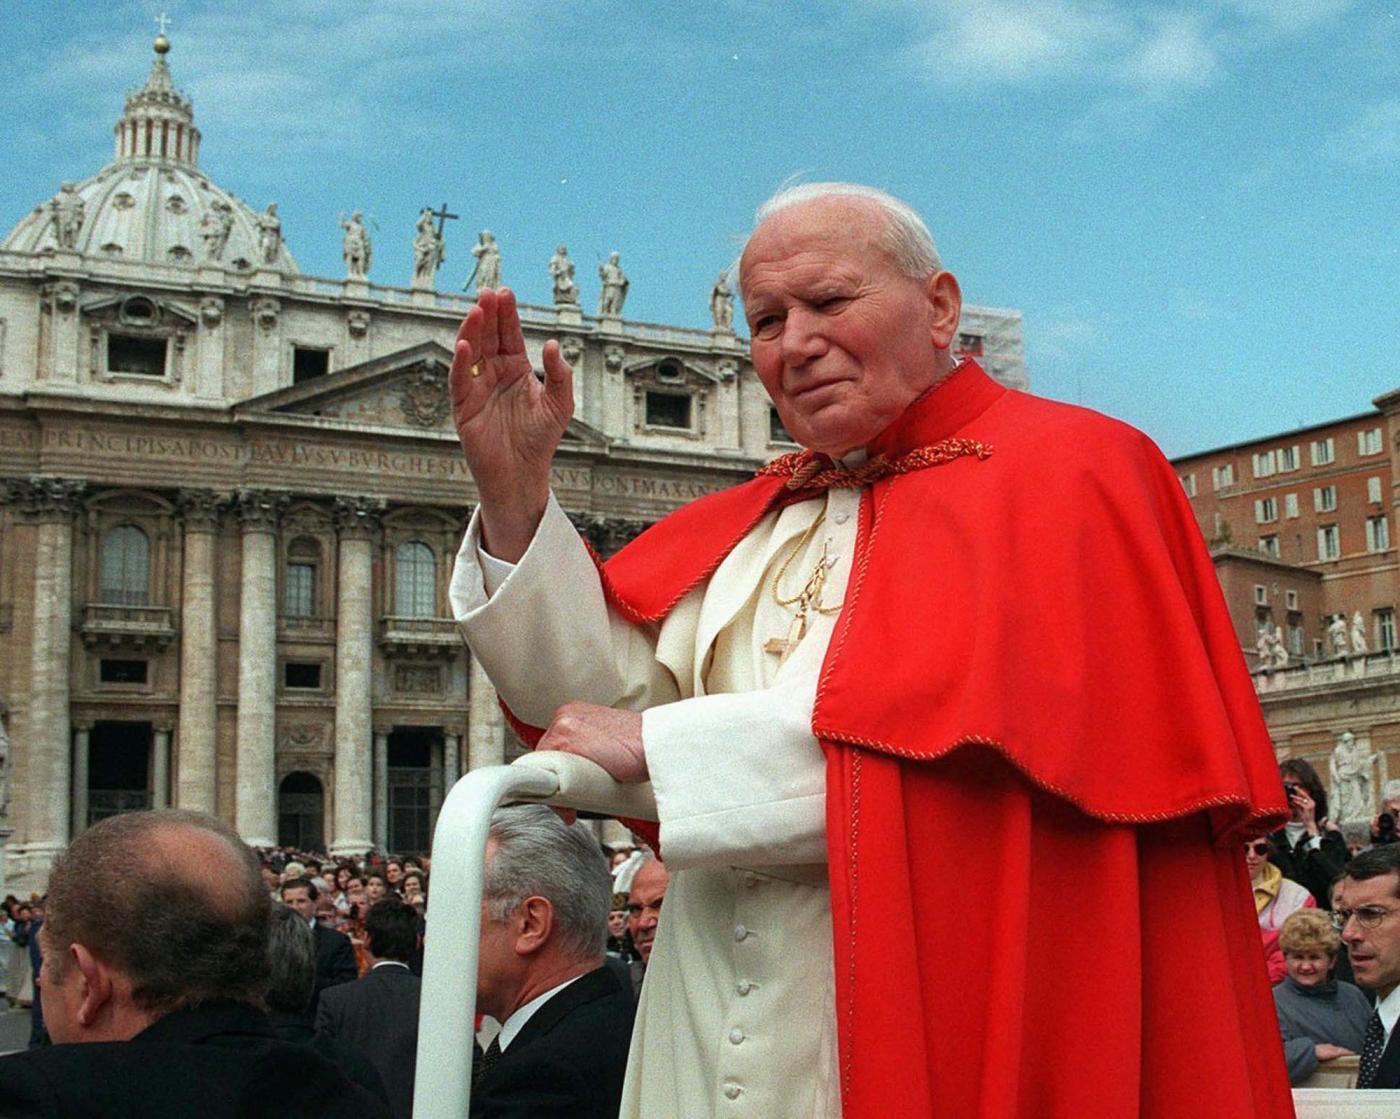 Giovanni Paolo II santo. Frasi, biografia e miracoli di Karol Wojtyla